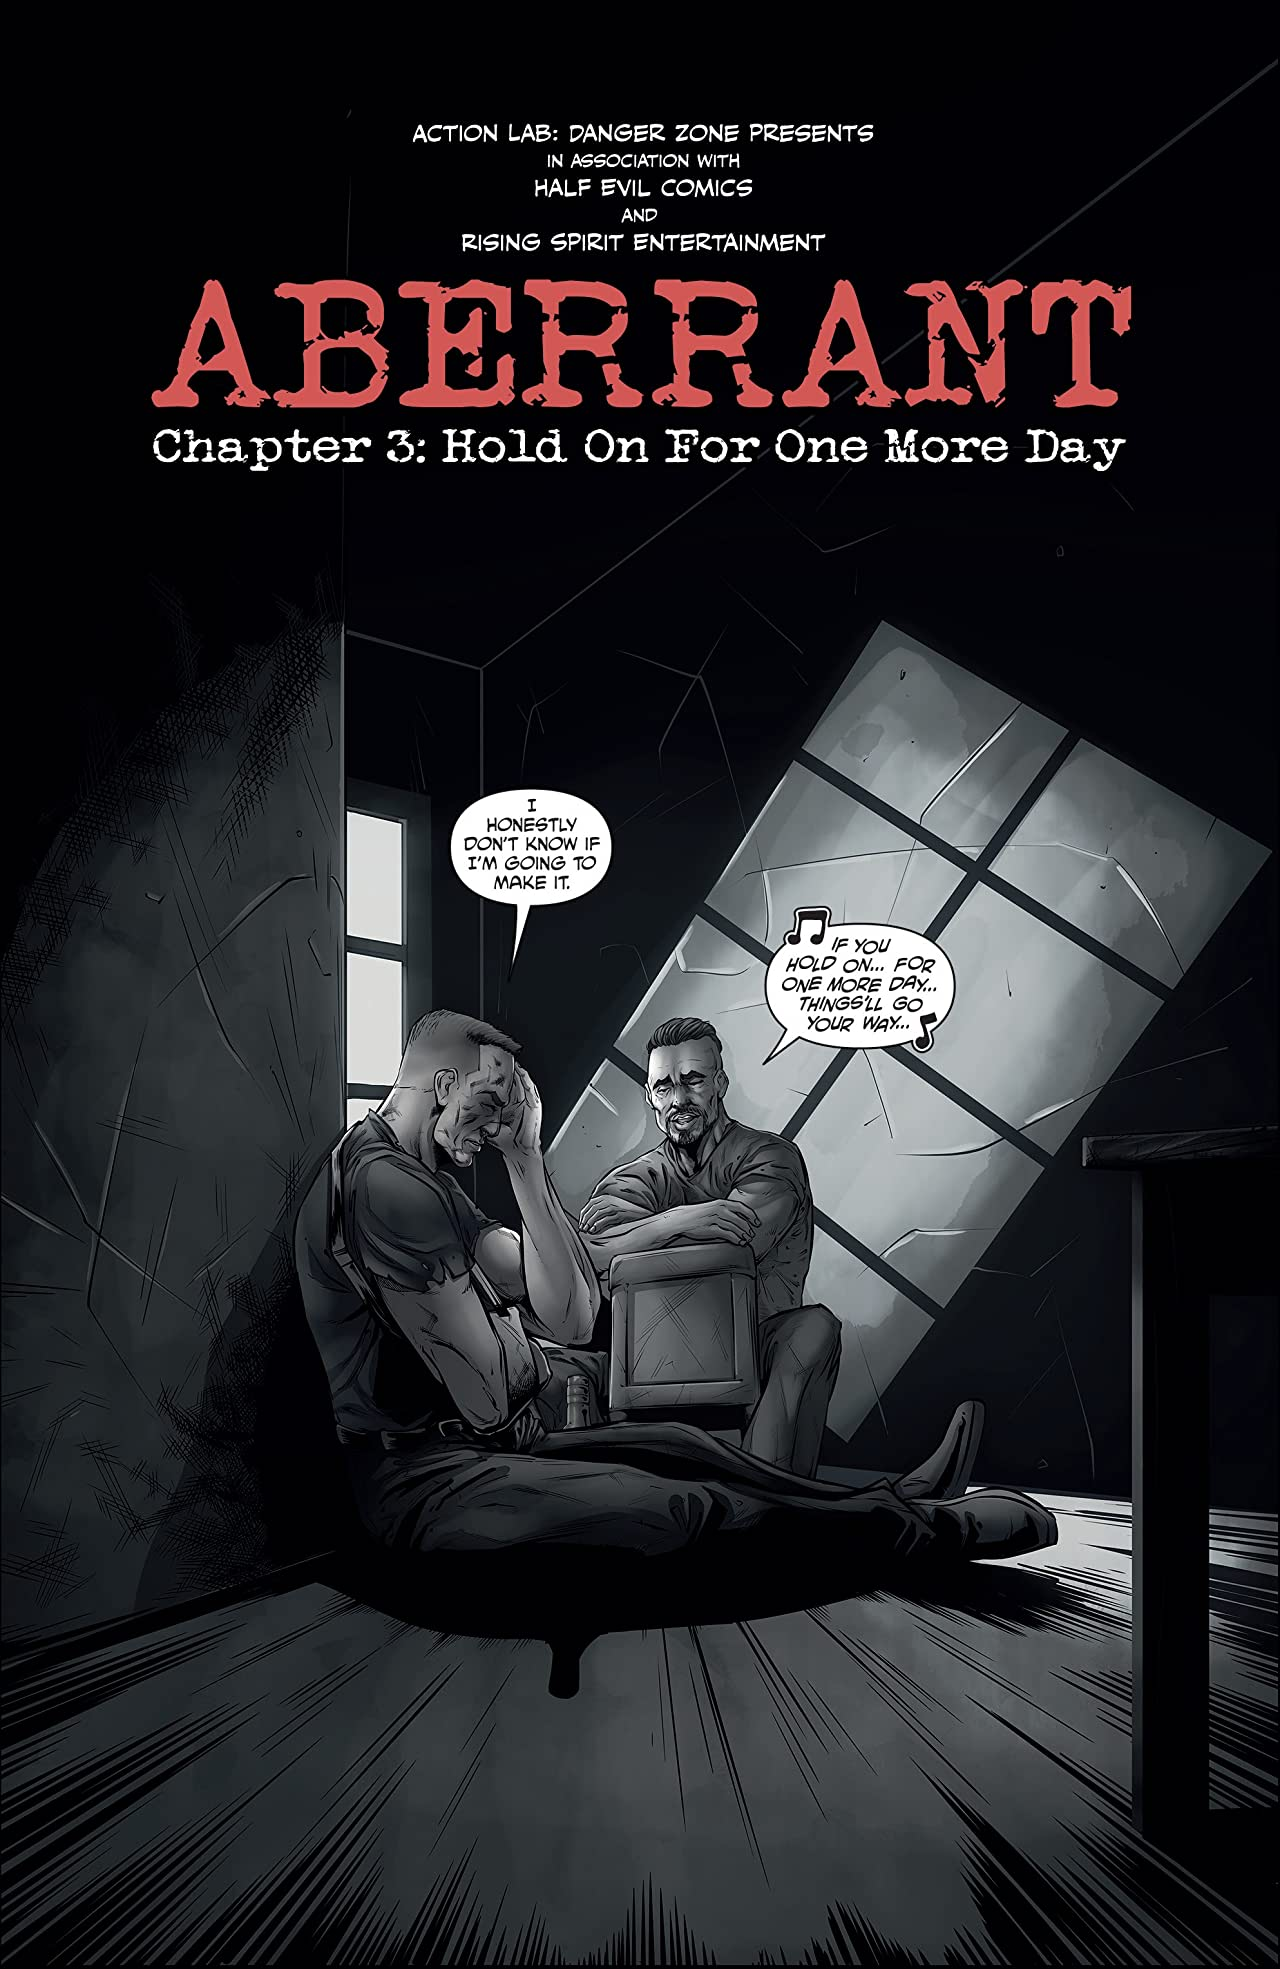 ABERRANT #3